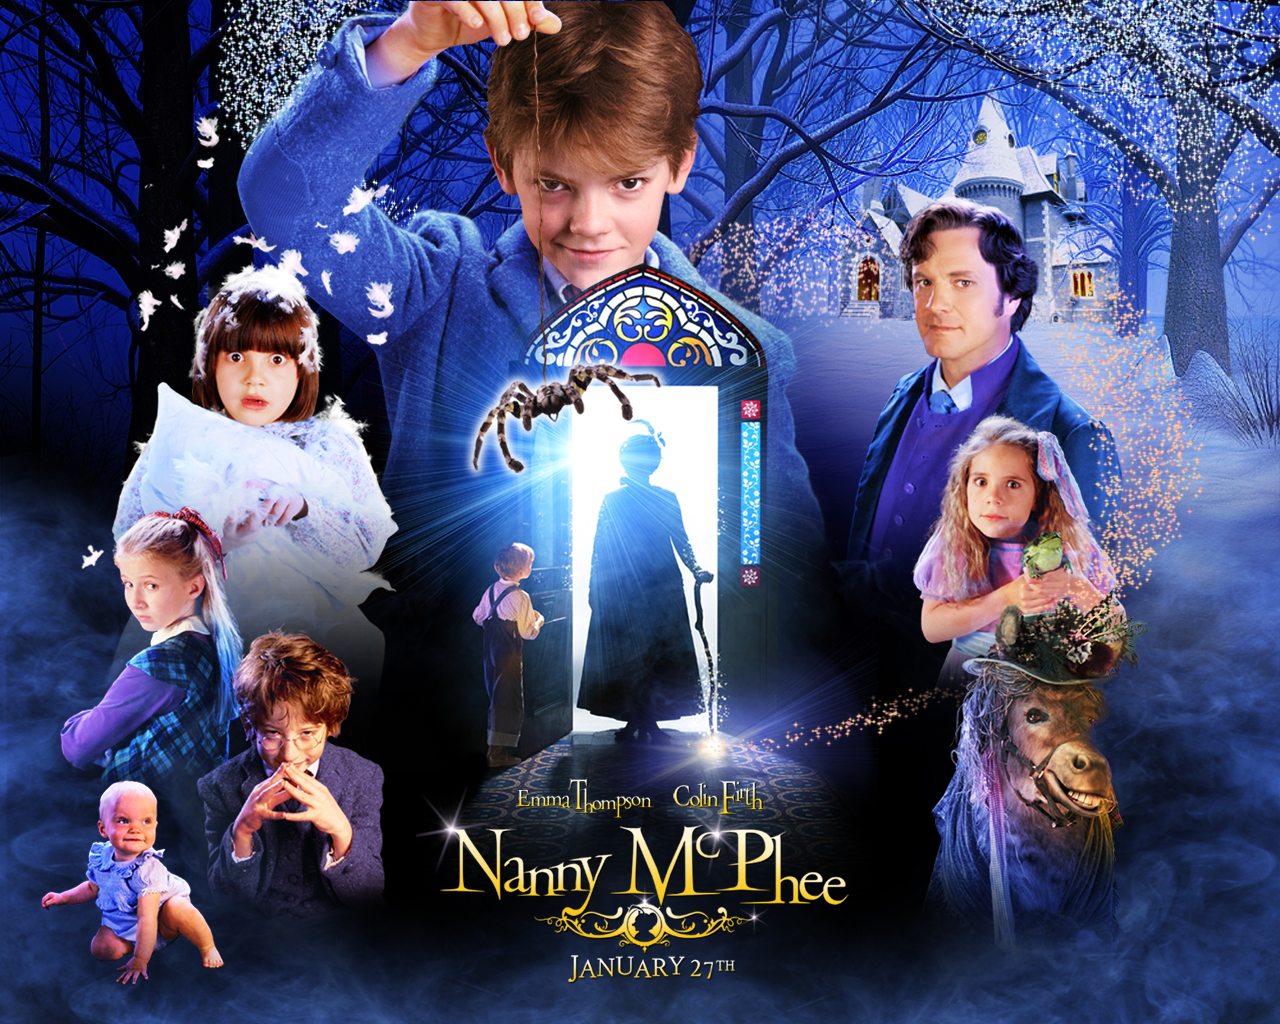 Nanny McPhee – Opening Titles (2005)